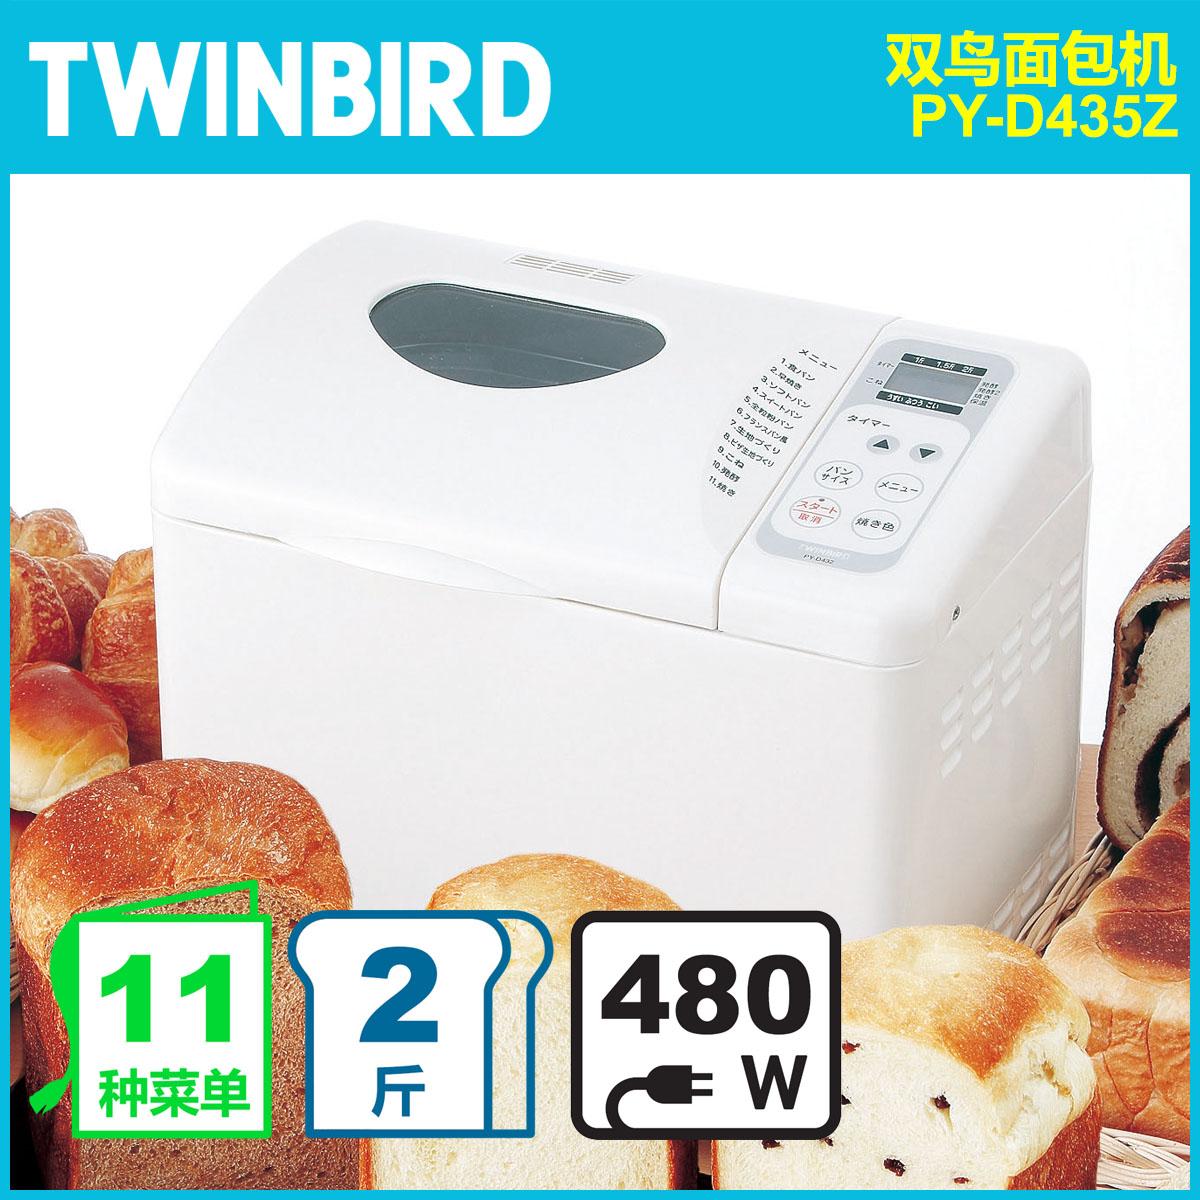 TWINBIRD/双鸟 PY-D435Z 家用全自动面包机和面发酵3D加热大容量